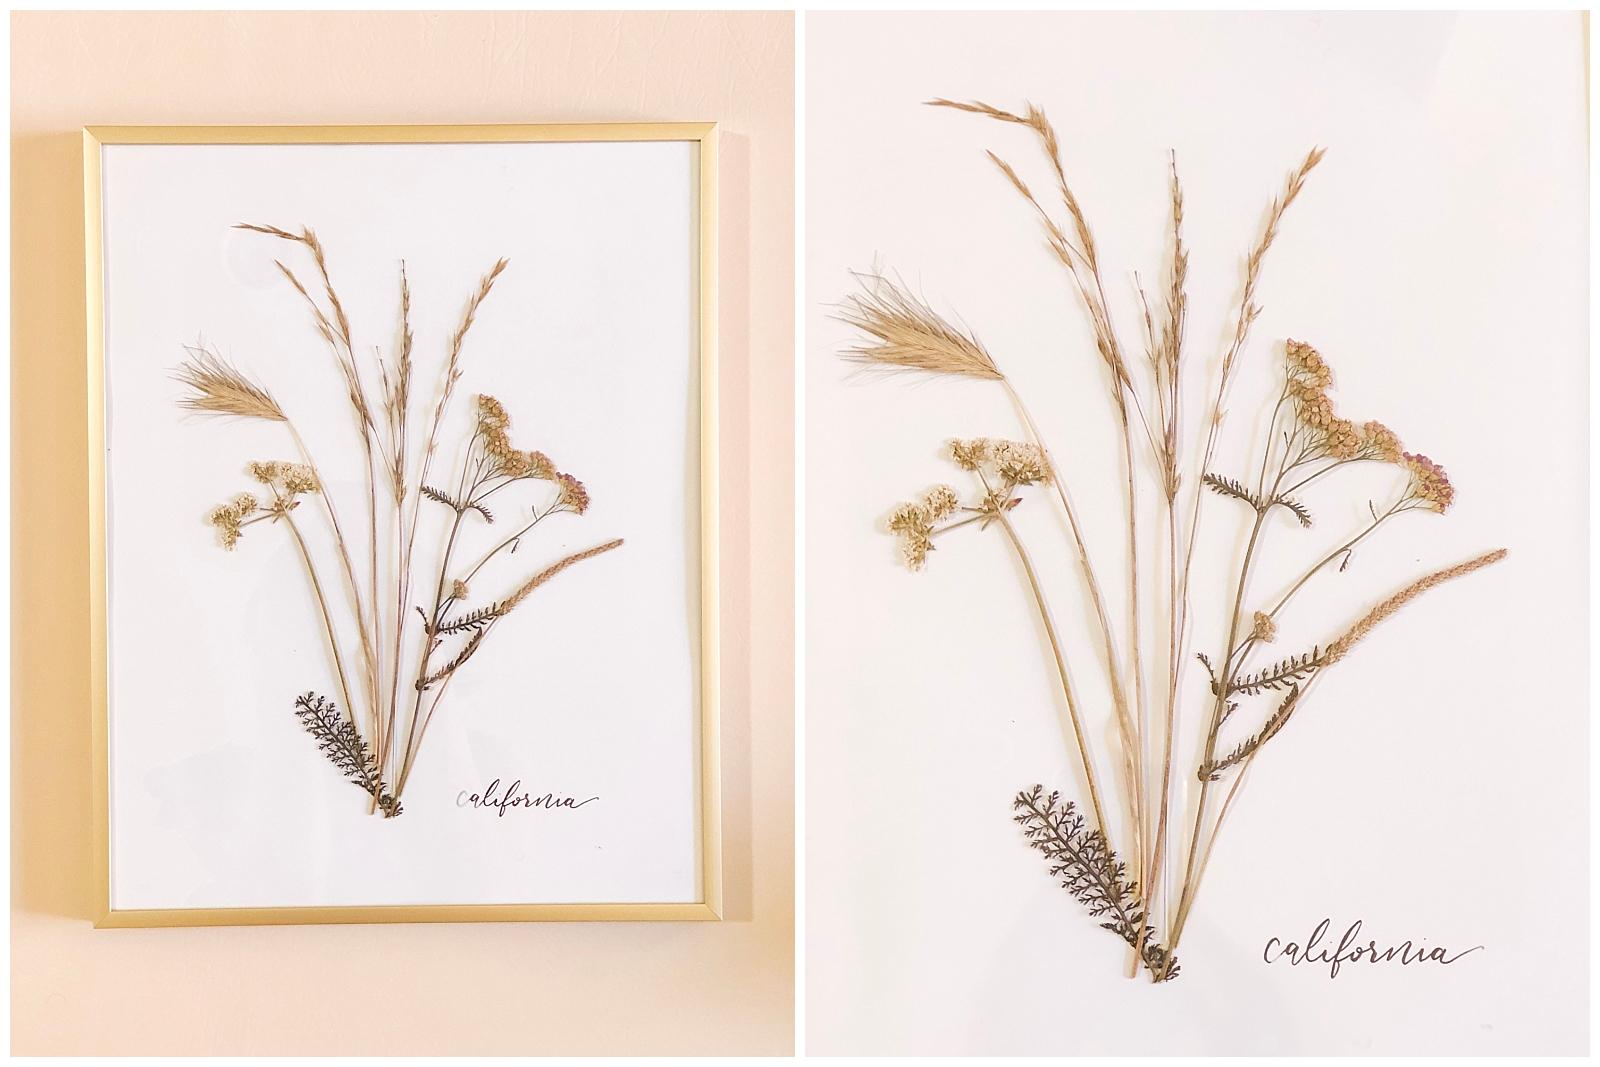 Coastal-California-Foliage-Pressed-Flowers-Phoenix-Feathers-Calligraphy